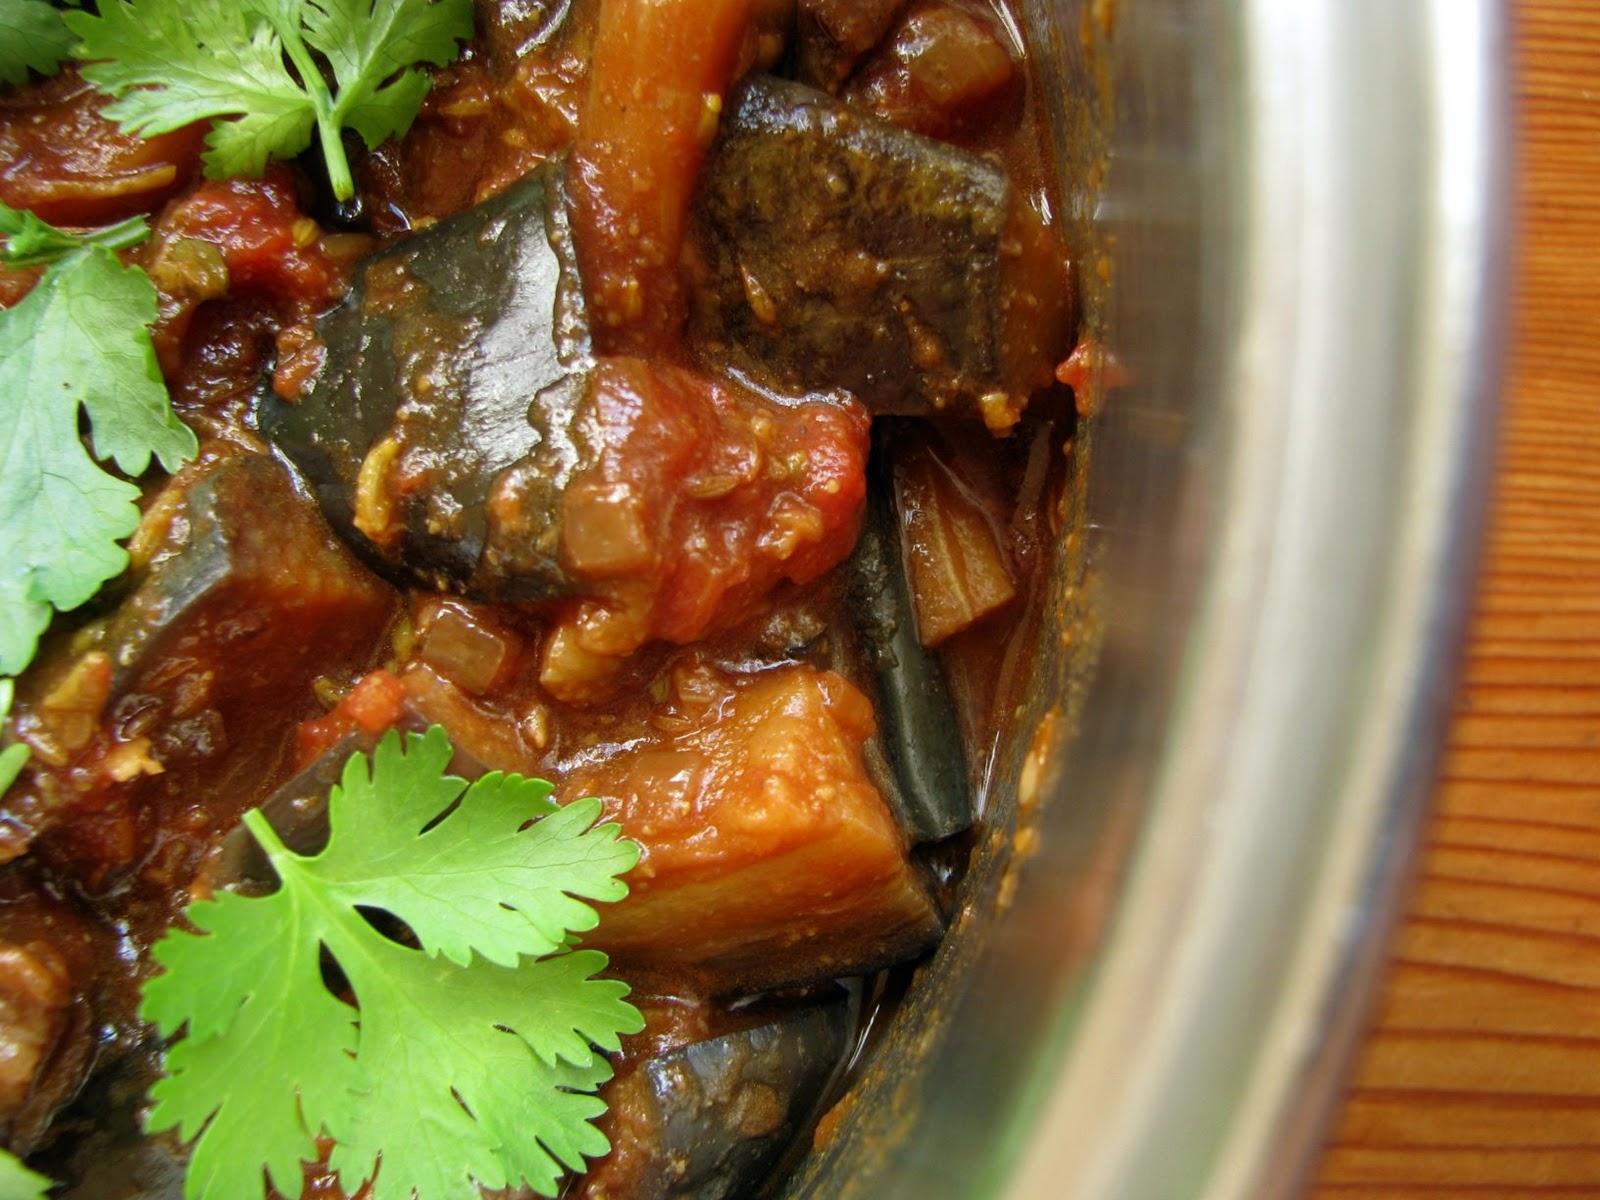 eggplant curry recipe – My Darling Lemon Thyme